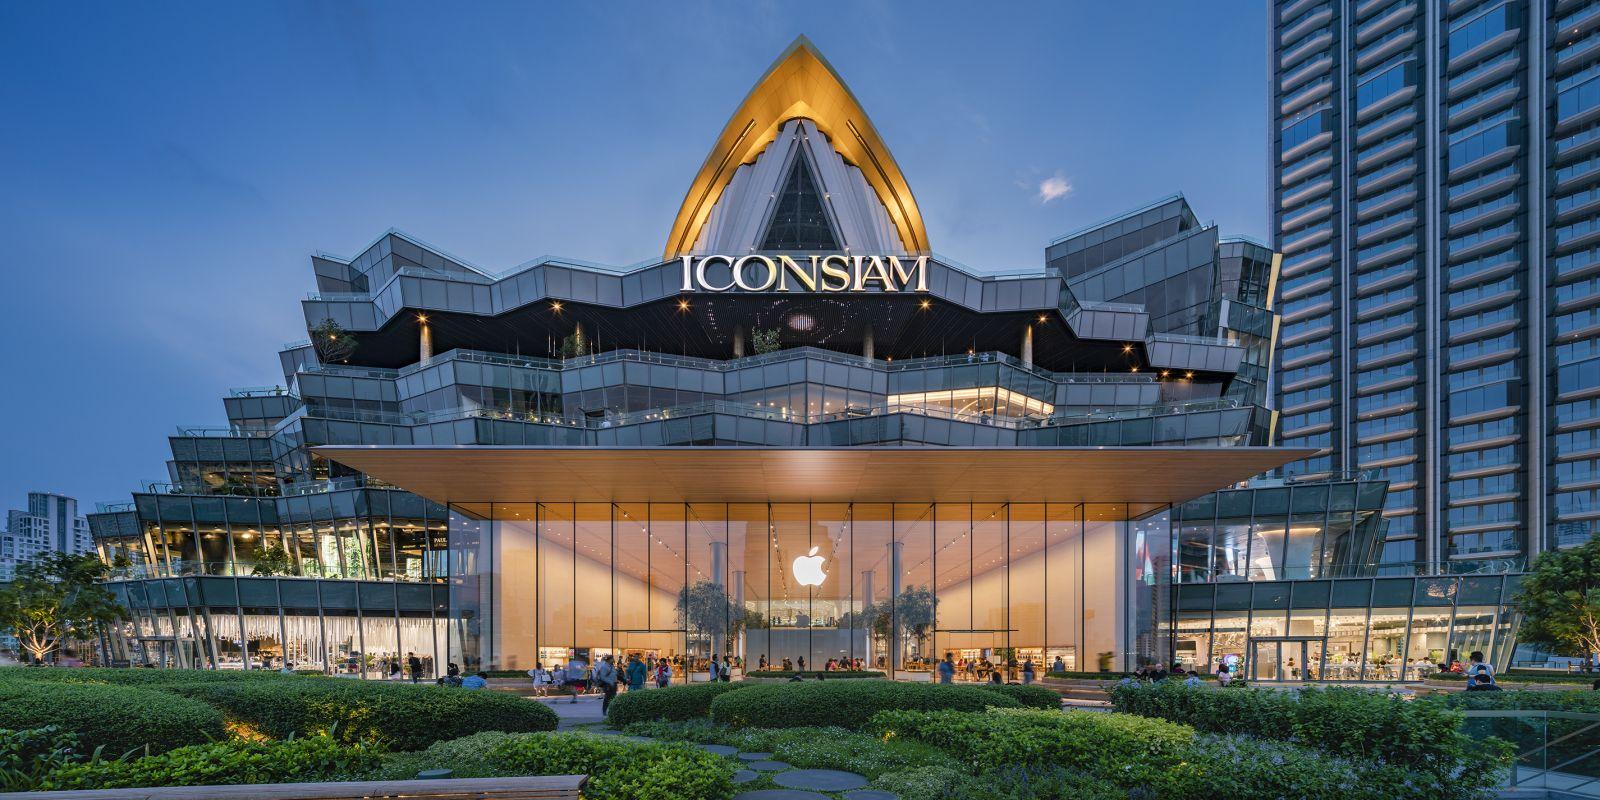 ICONSIAM Landscape design, Building facade, Aesthetic